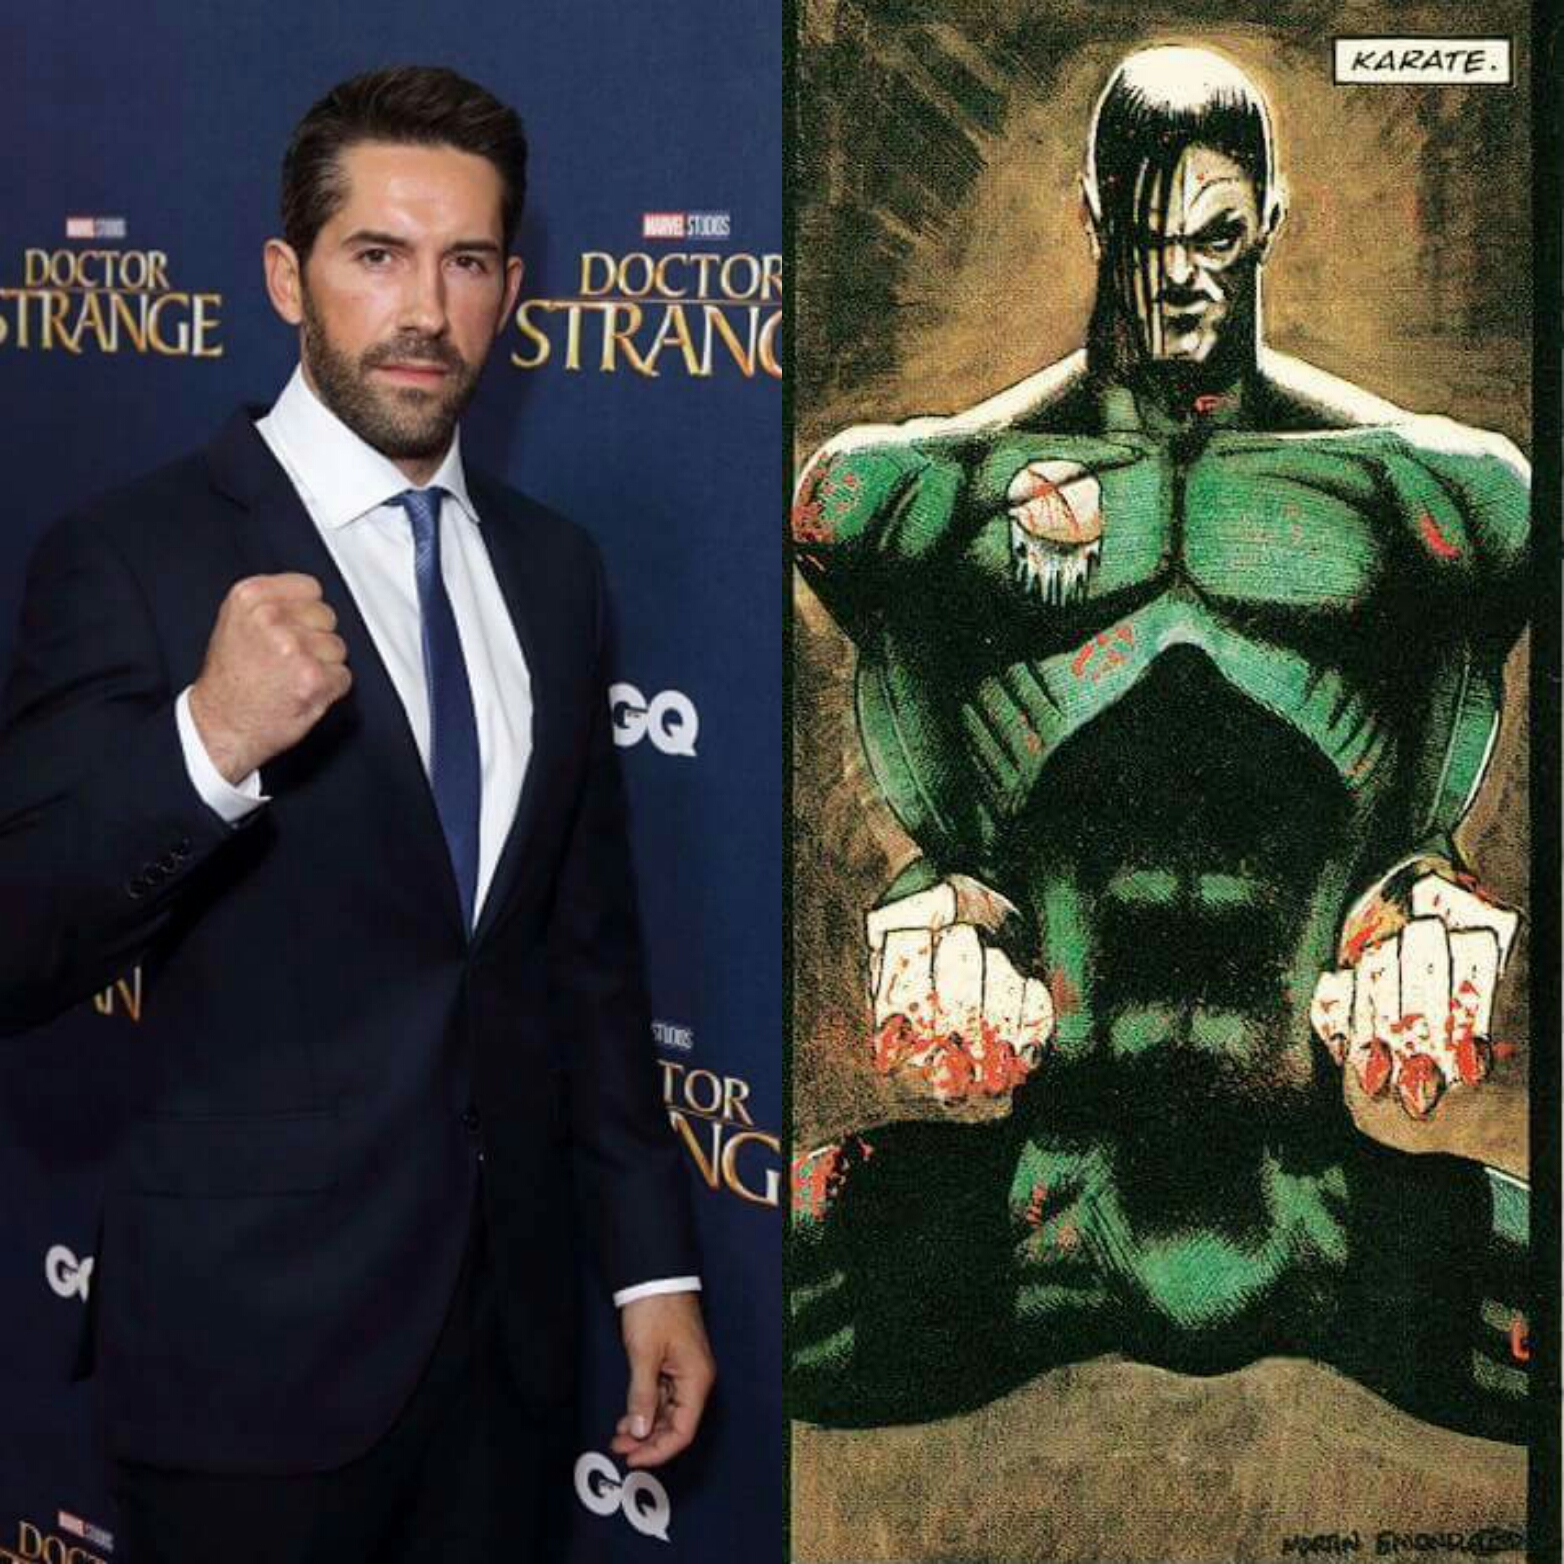 ACCIDENT MAN: Martial Arts Star Scott Adkins To Star, Cast